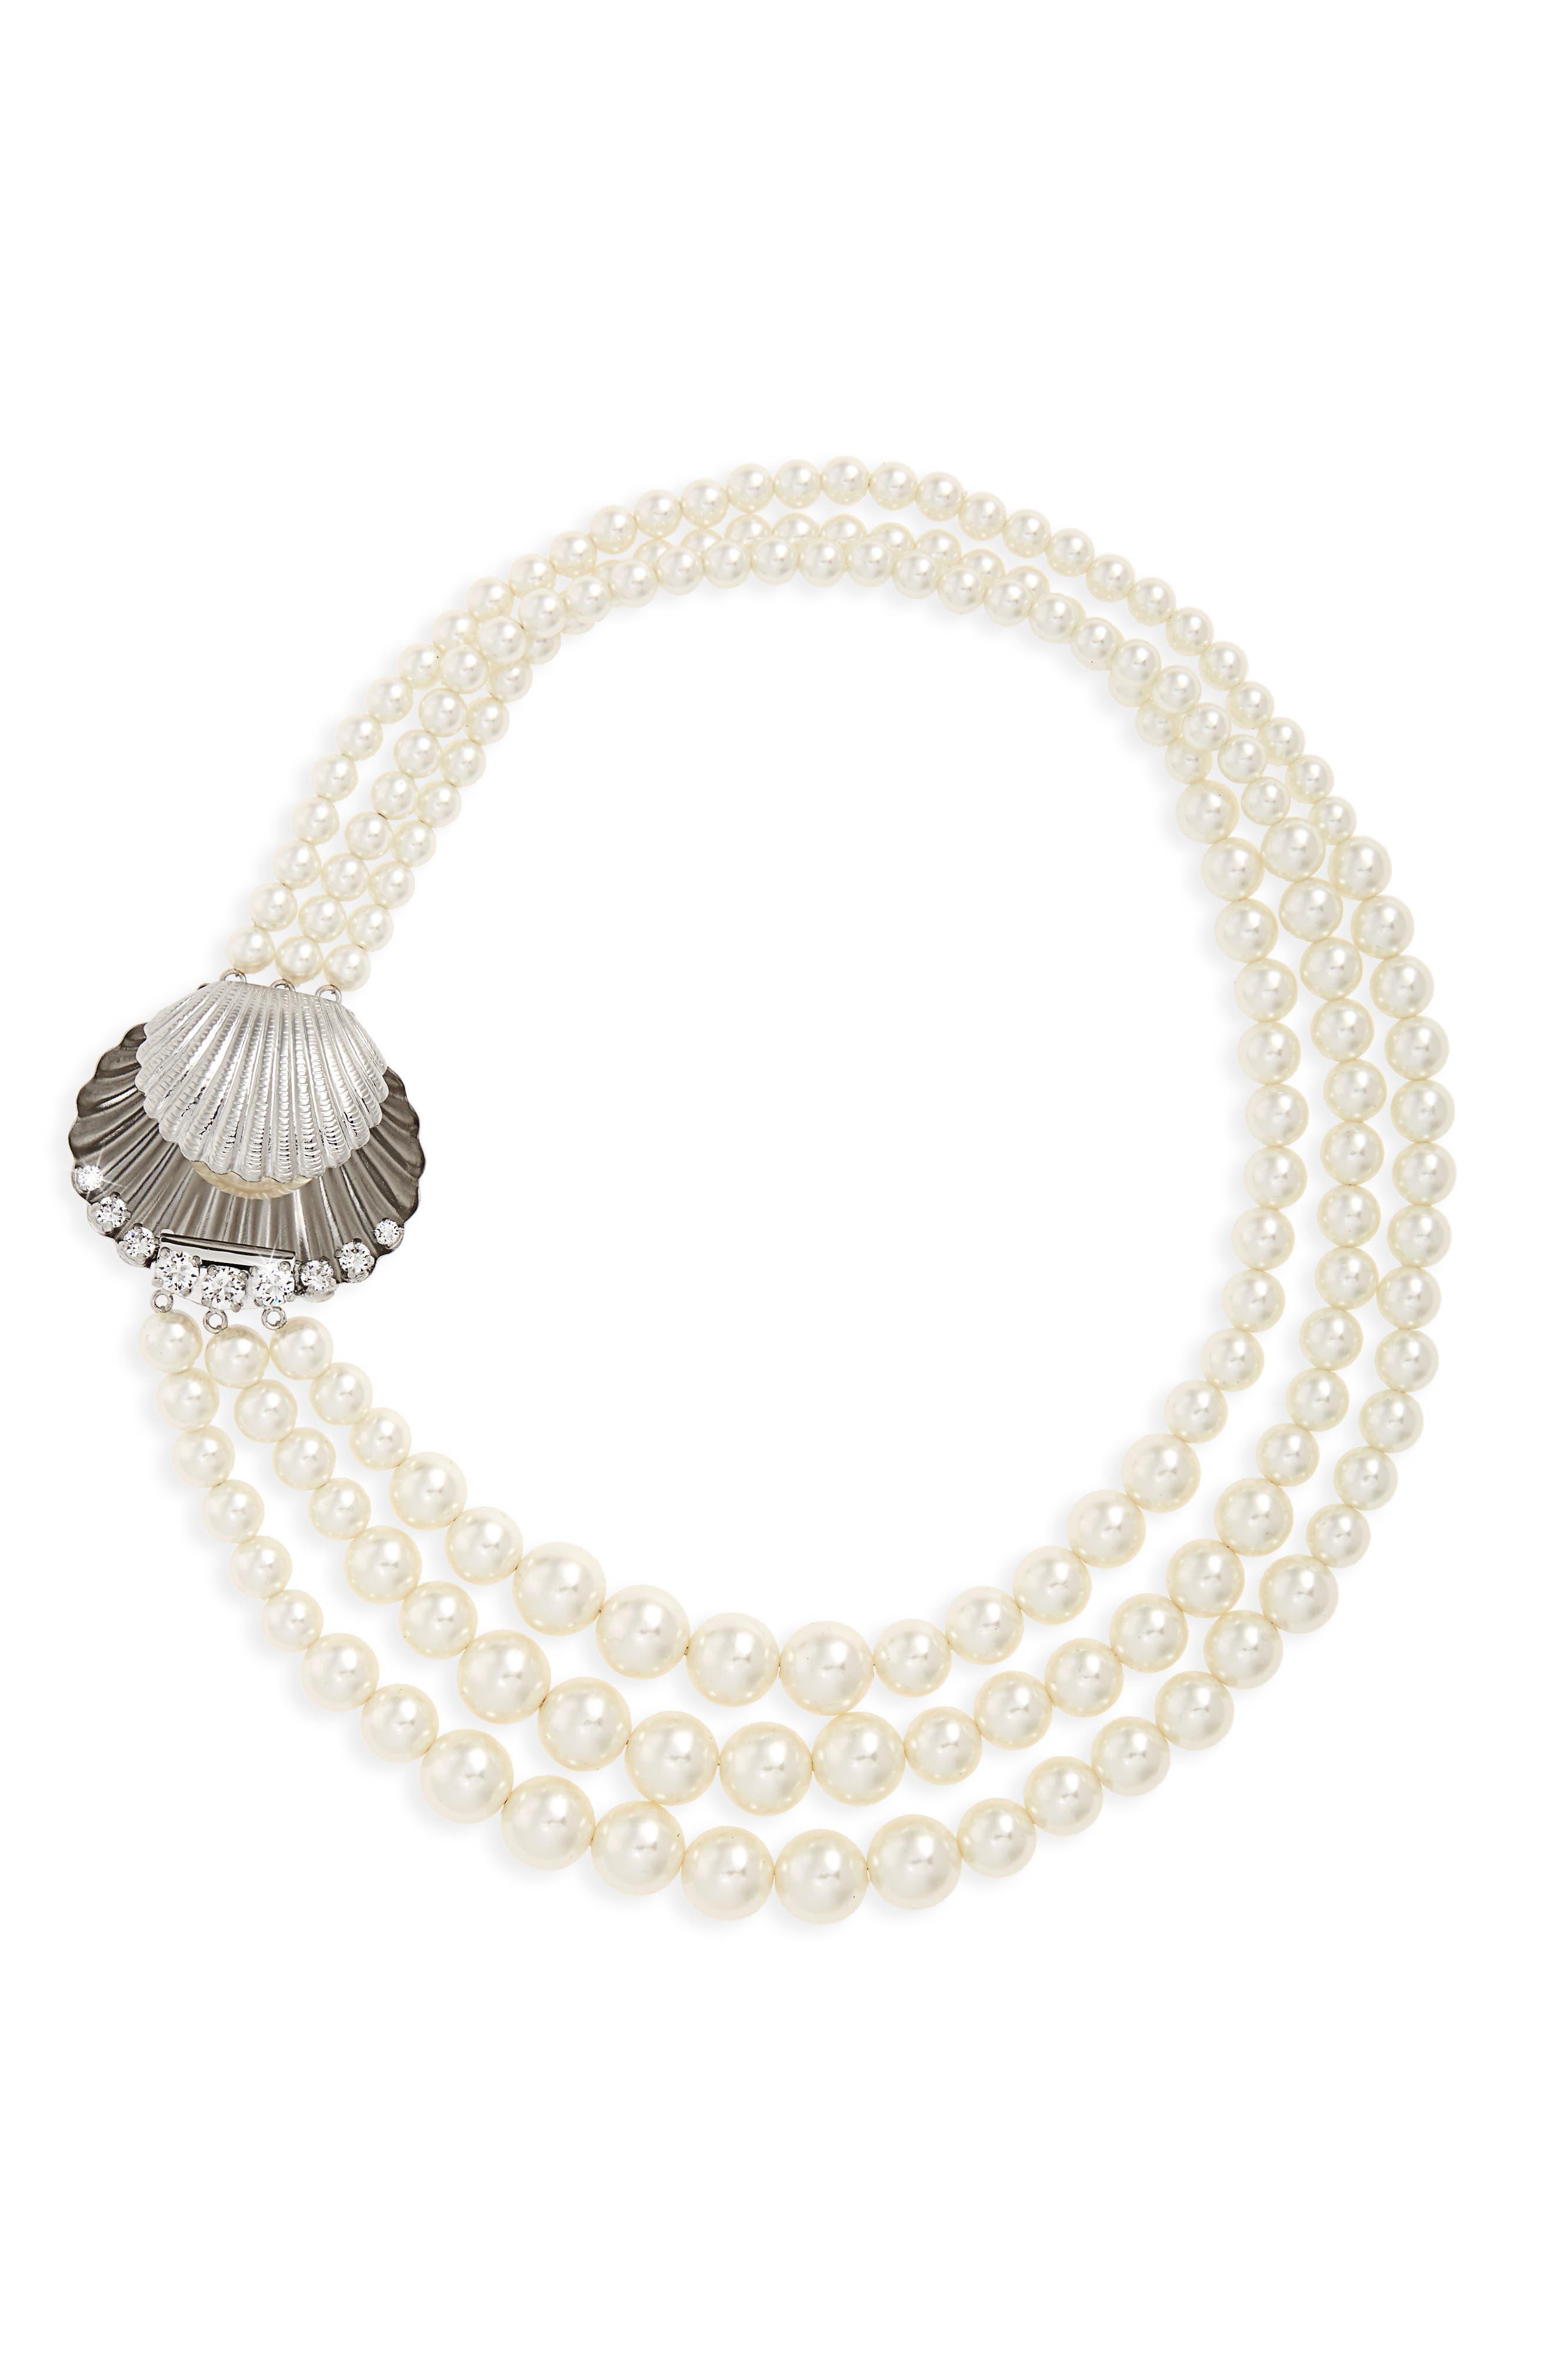 Alternate Image 1 Selected - Miu Miu Multistrand Imitation Pearl Necklace